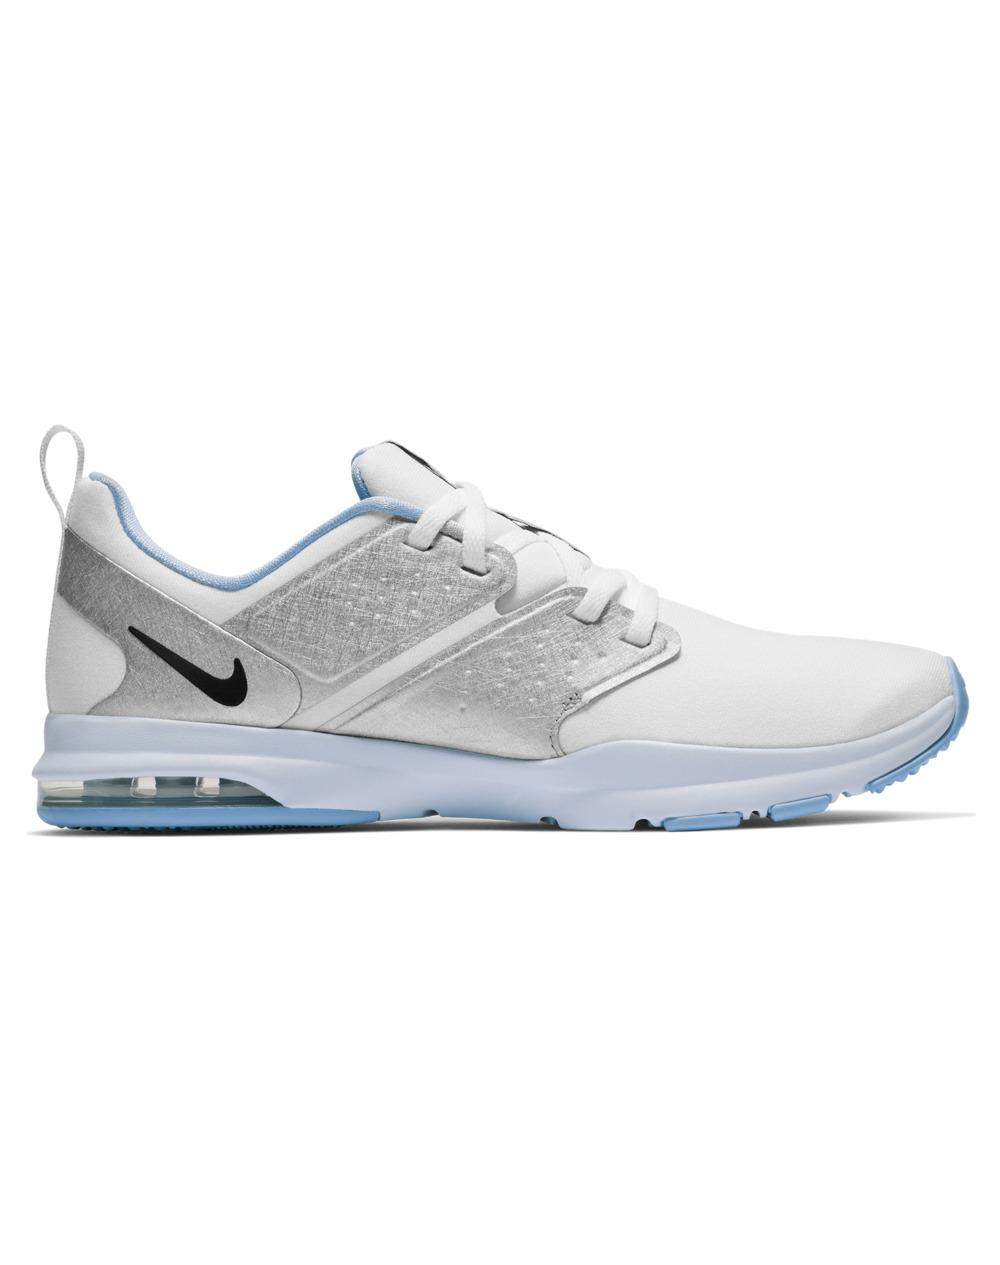 90cbd50c35f2 Nike. Women s Gray Air Bella Tr Fitness cross Training Shoes. £70 From El  Corte Ingles